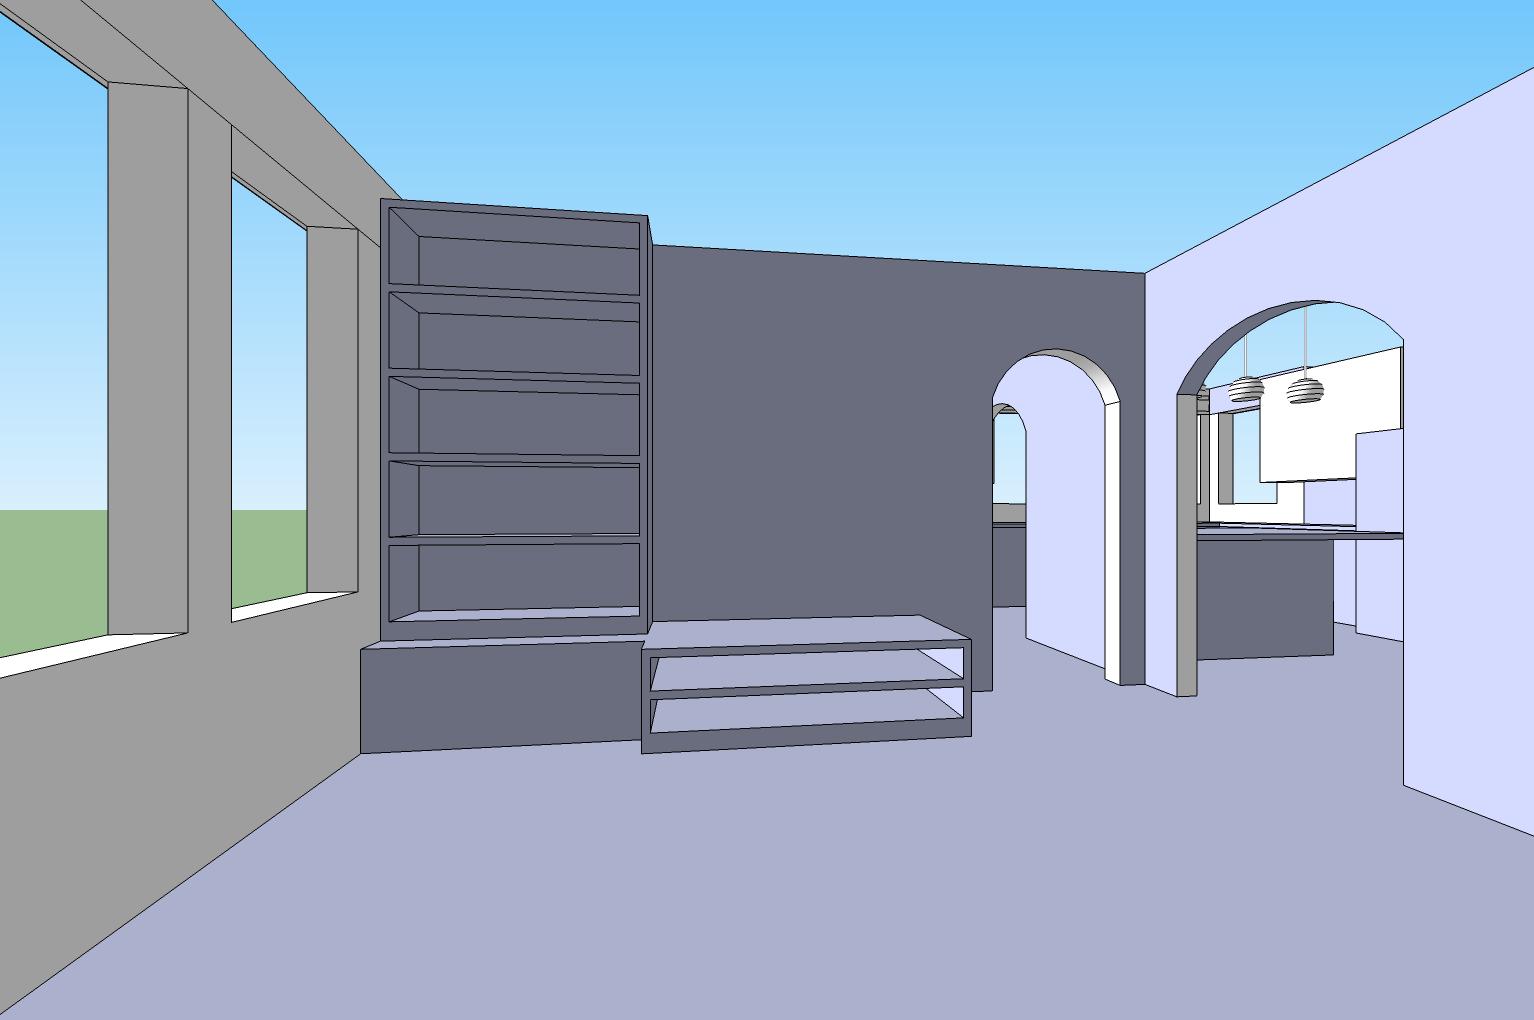 totw google sketchup and house design jason patz